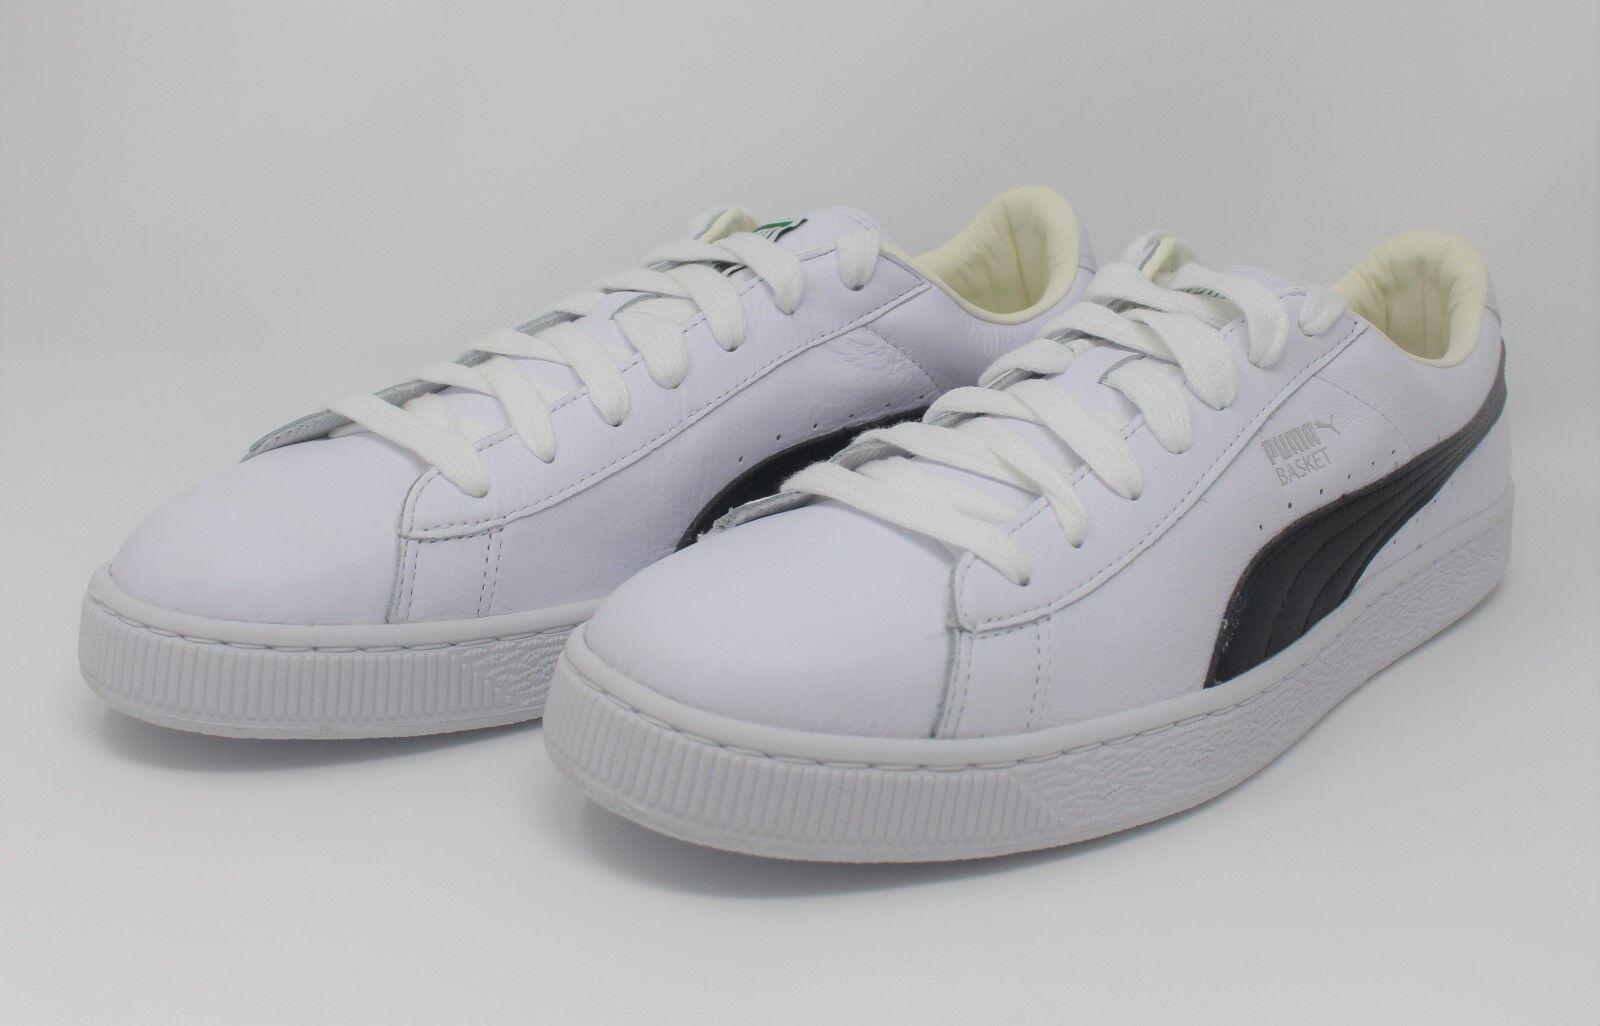 Puma Basket Classic LFS White/Black Model#: 354367-22, Comfortable Seasonal price cuts, discount benefits